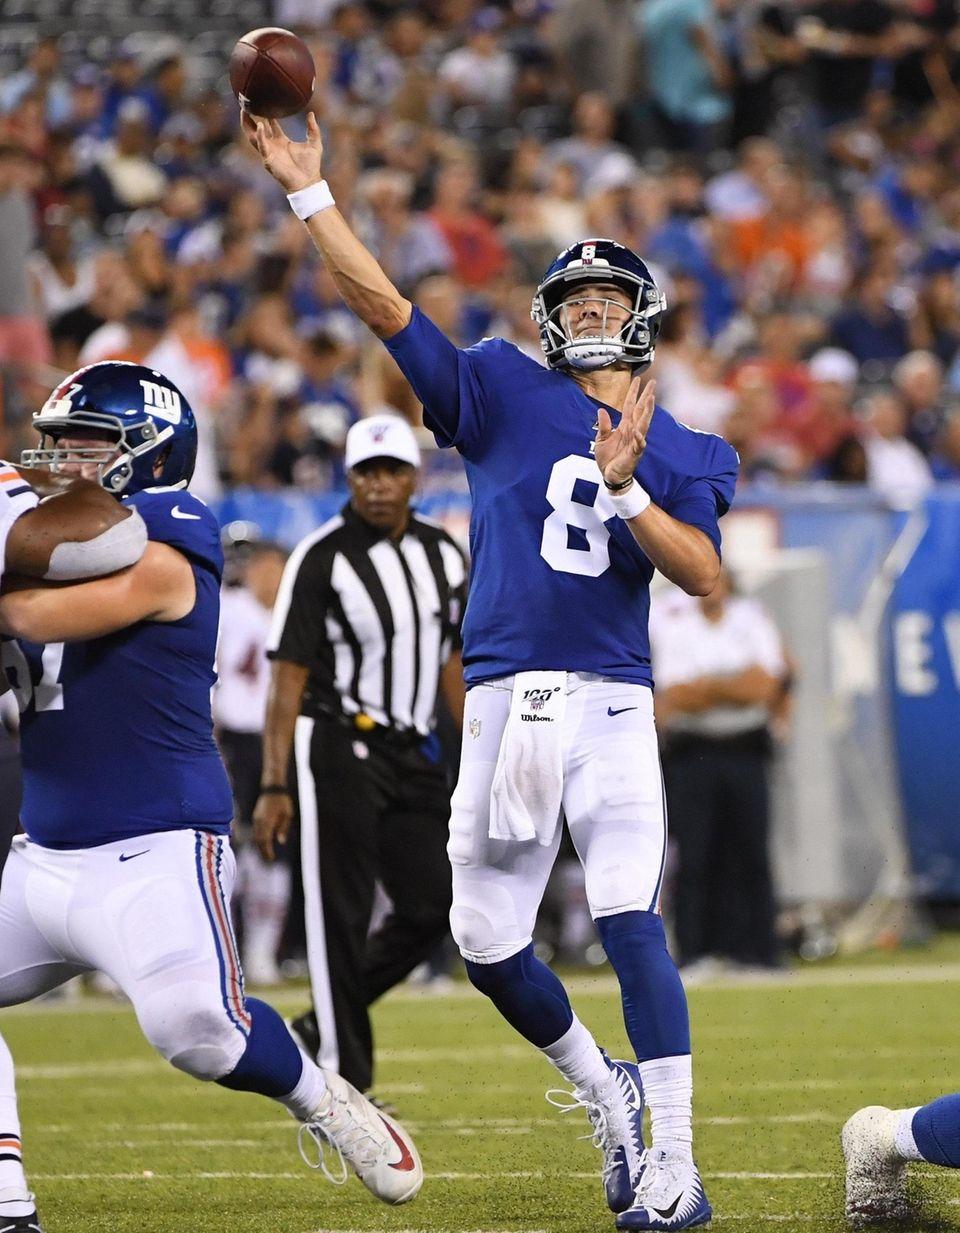 New York Giants quarterback Daniel Jones passes the